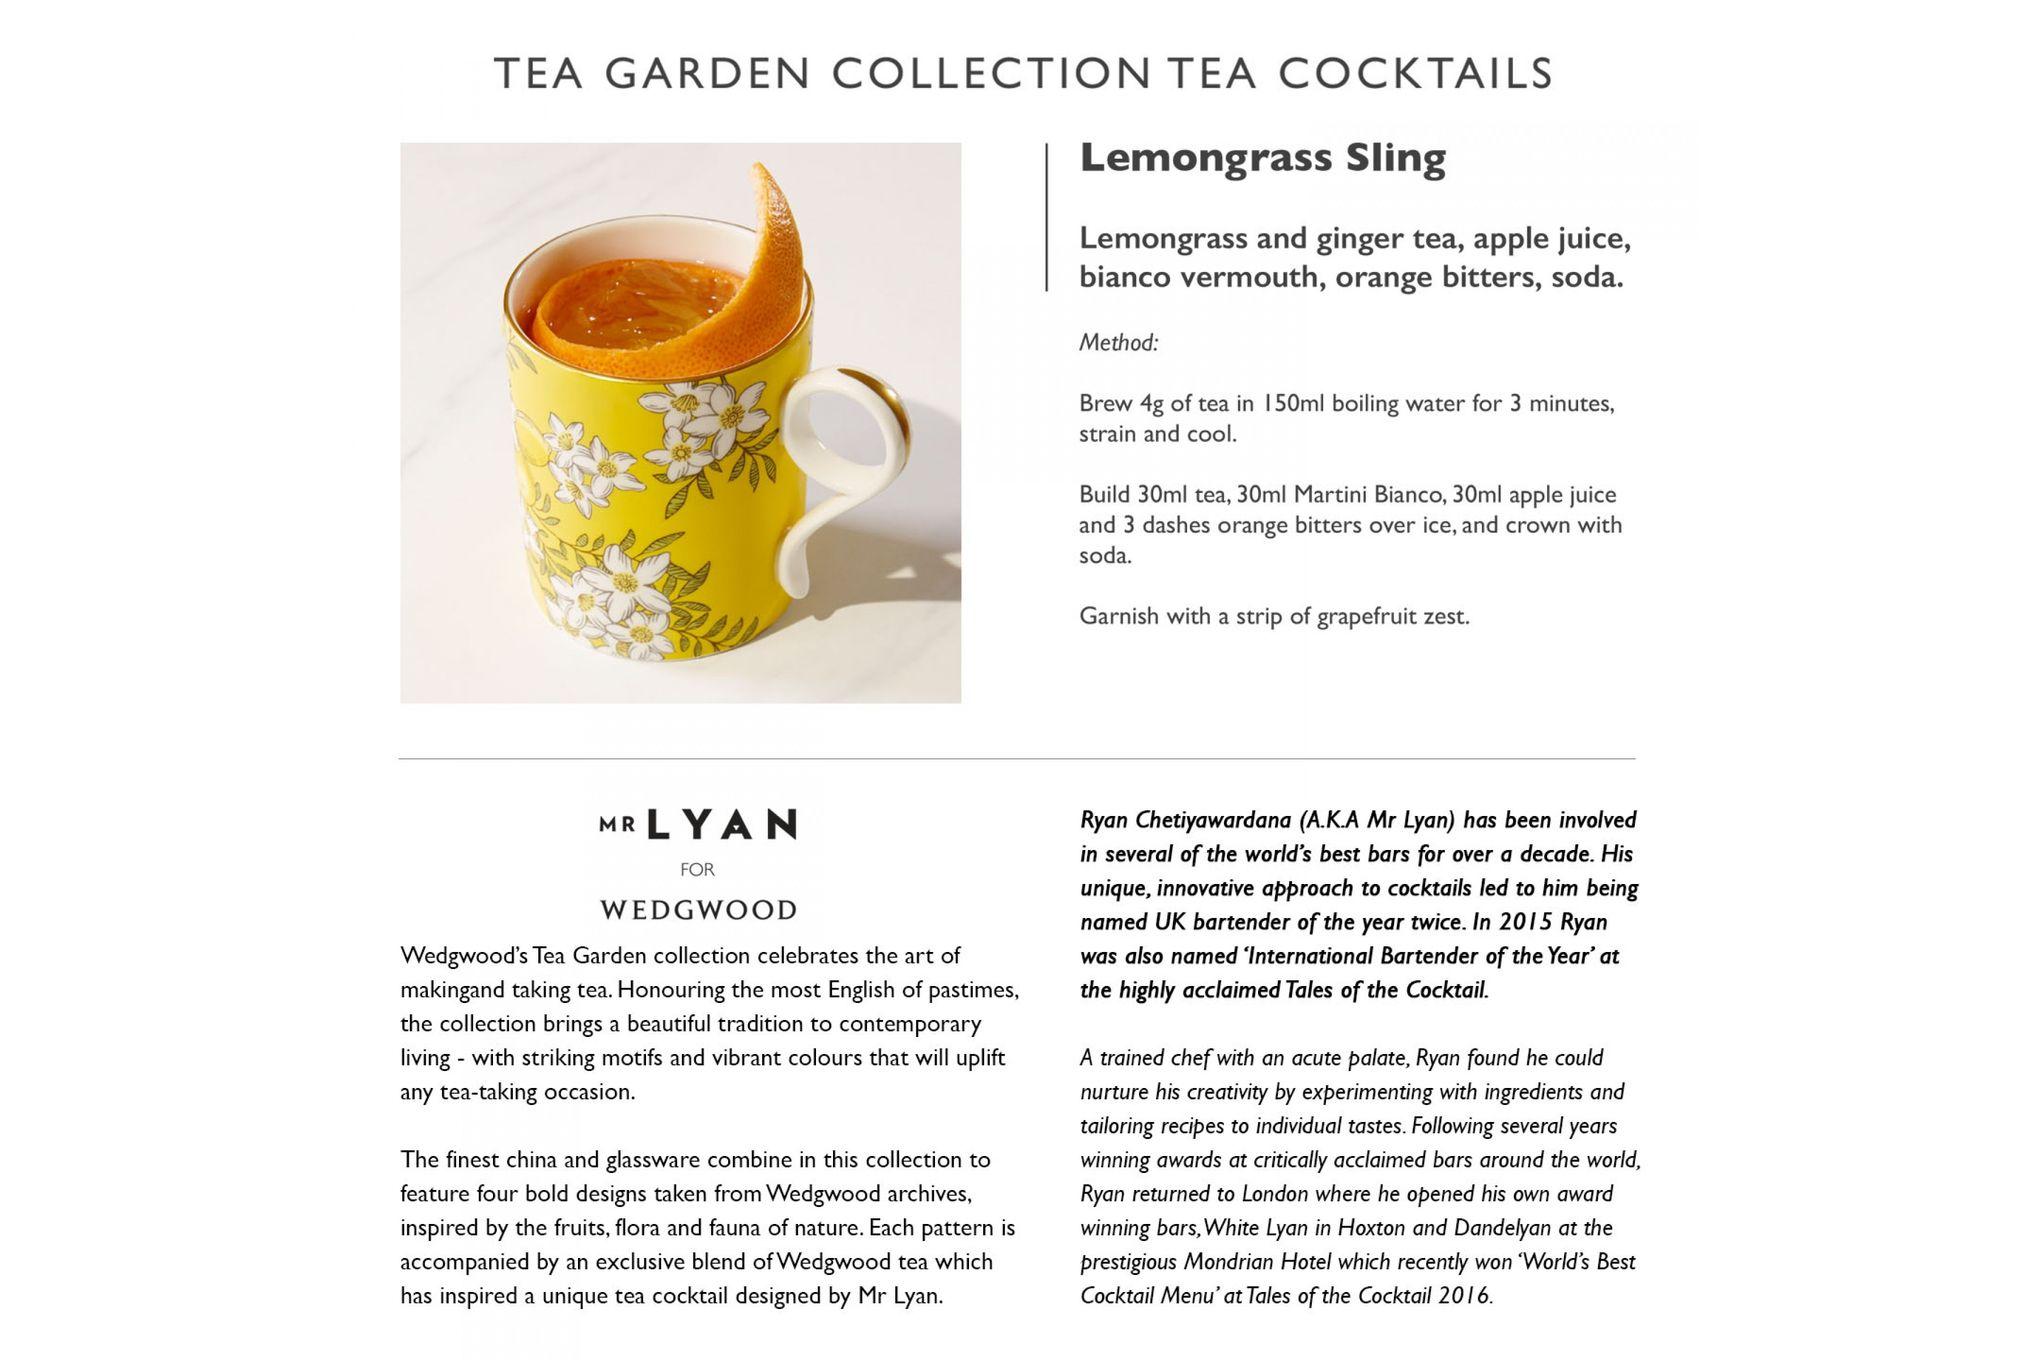 Wedgwood Tea Garden 3 Piece Set Plate 21cm, Teacup & Saucer Lemon & Ginger thumb 3